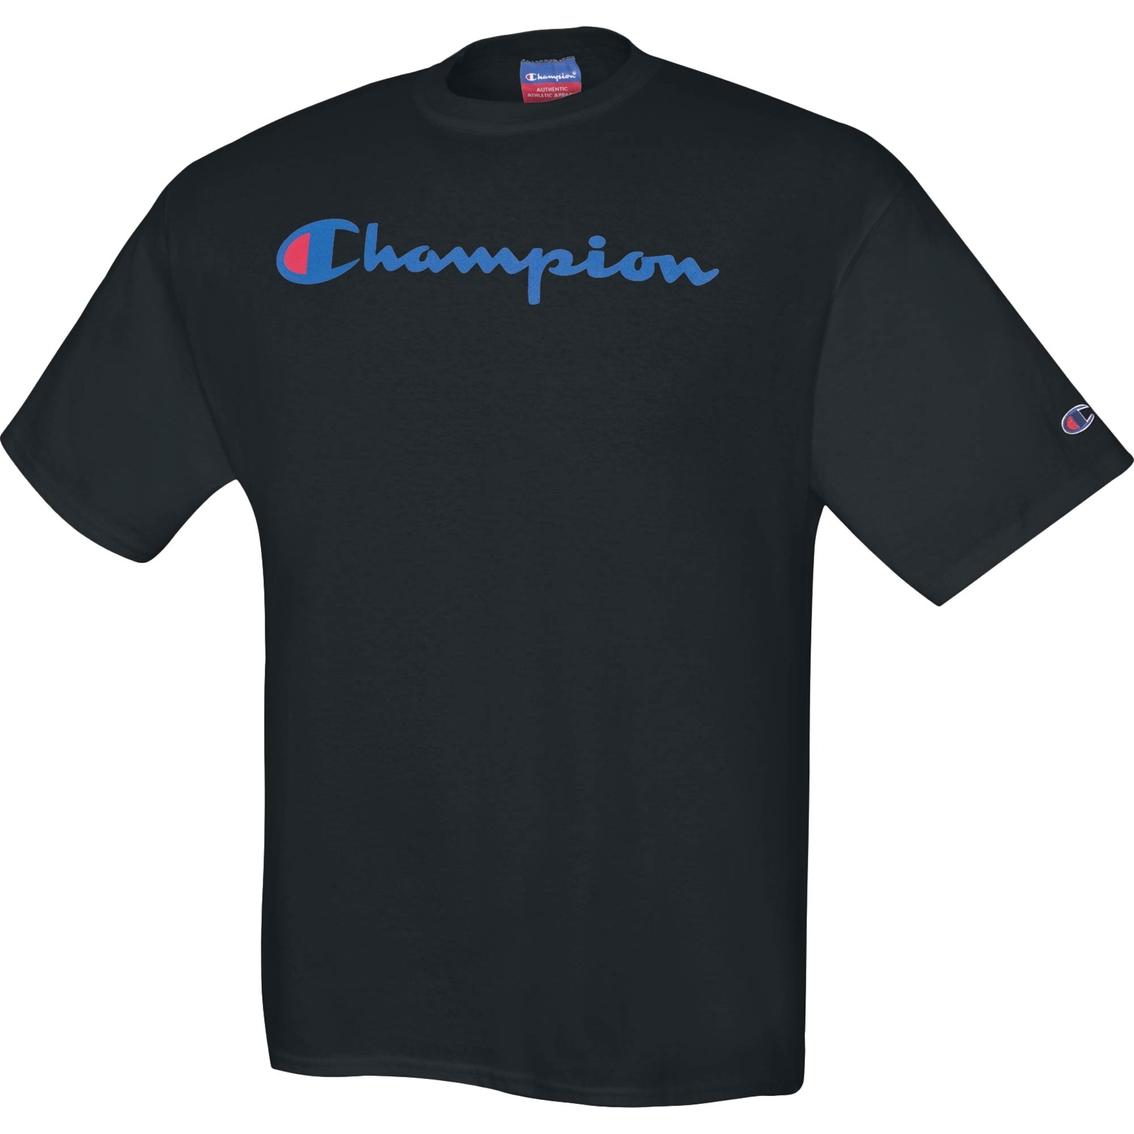 Champion Heritage Tee Shirts Apparel Shop The Exchange